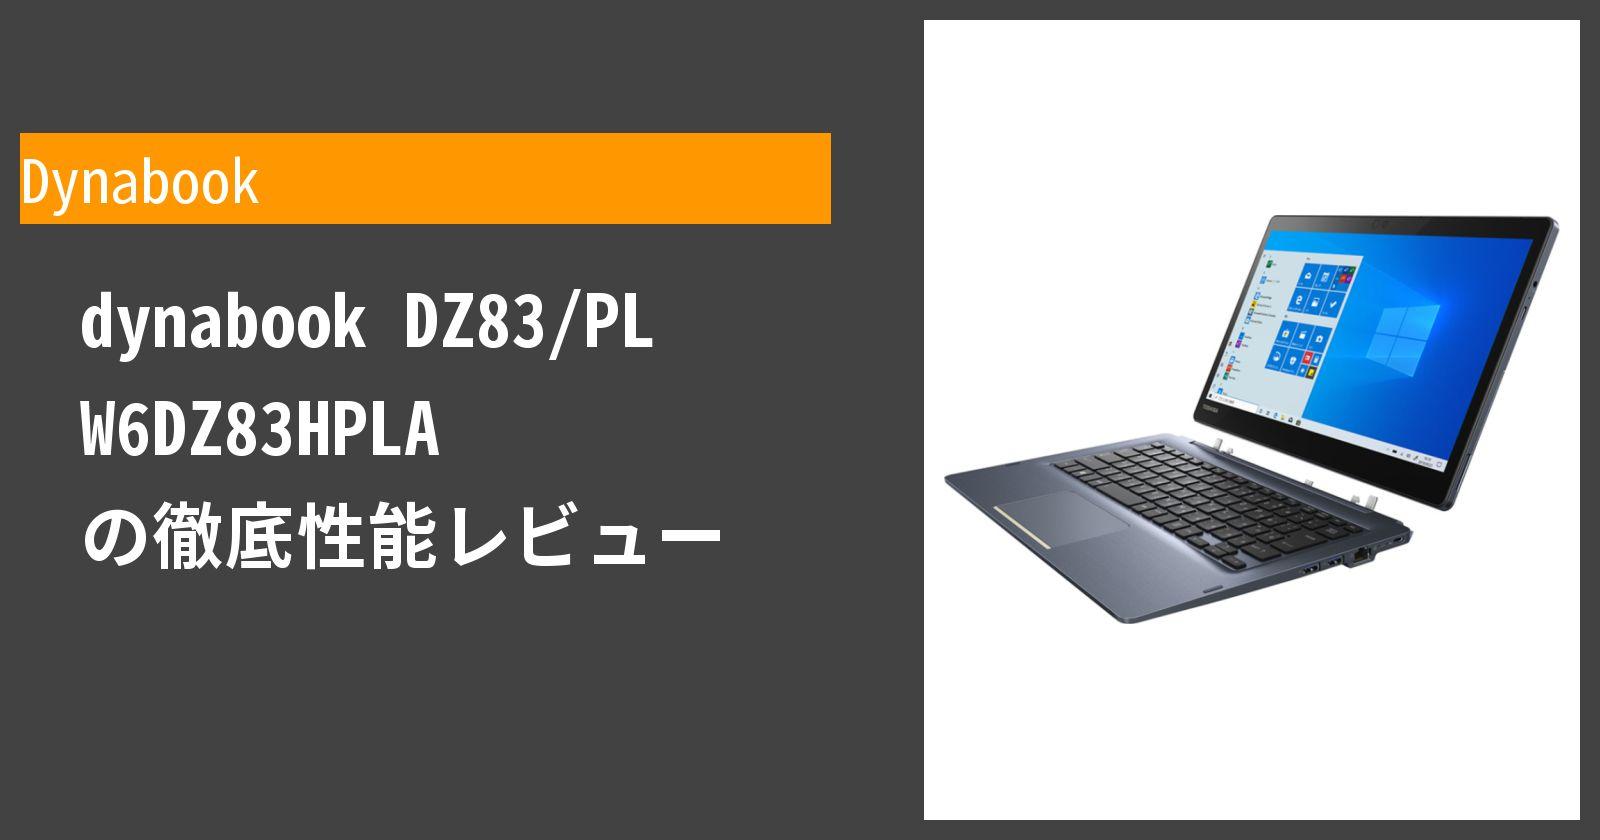 dynabook DZ83/PL W6DZ83HPLA の徹底性能レビュー